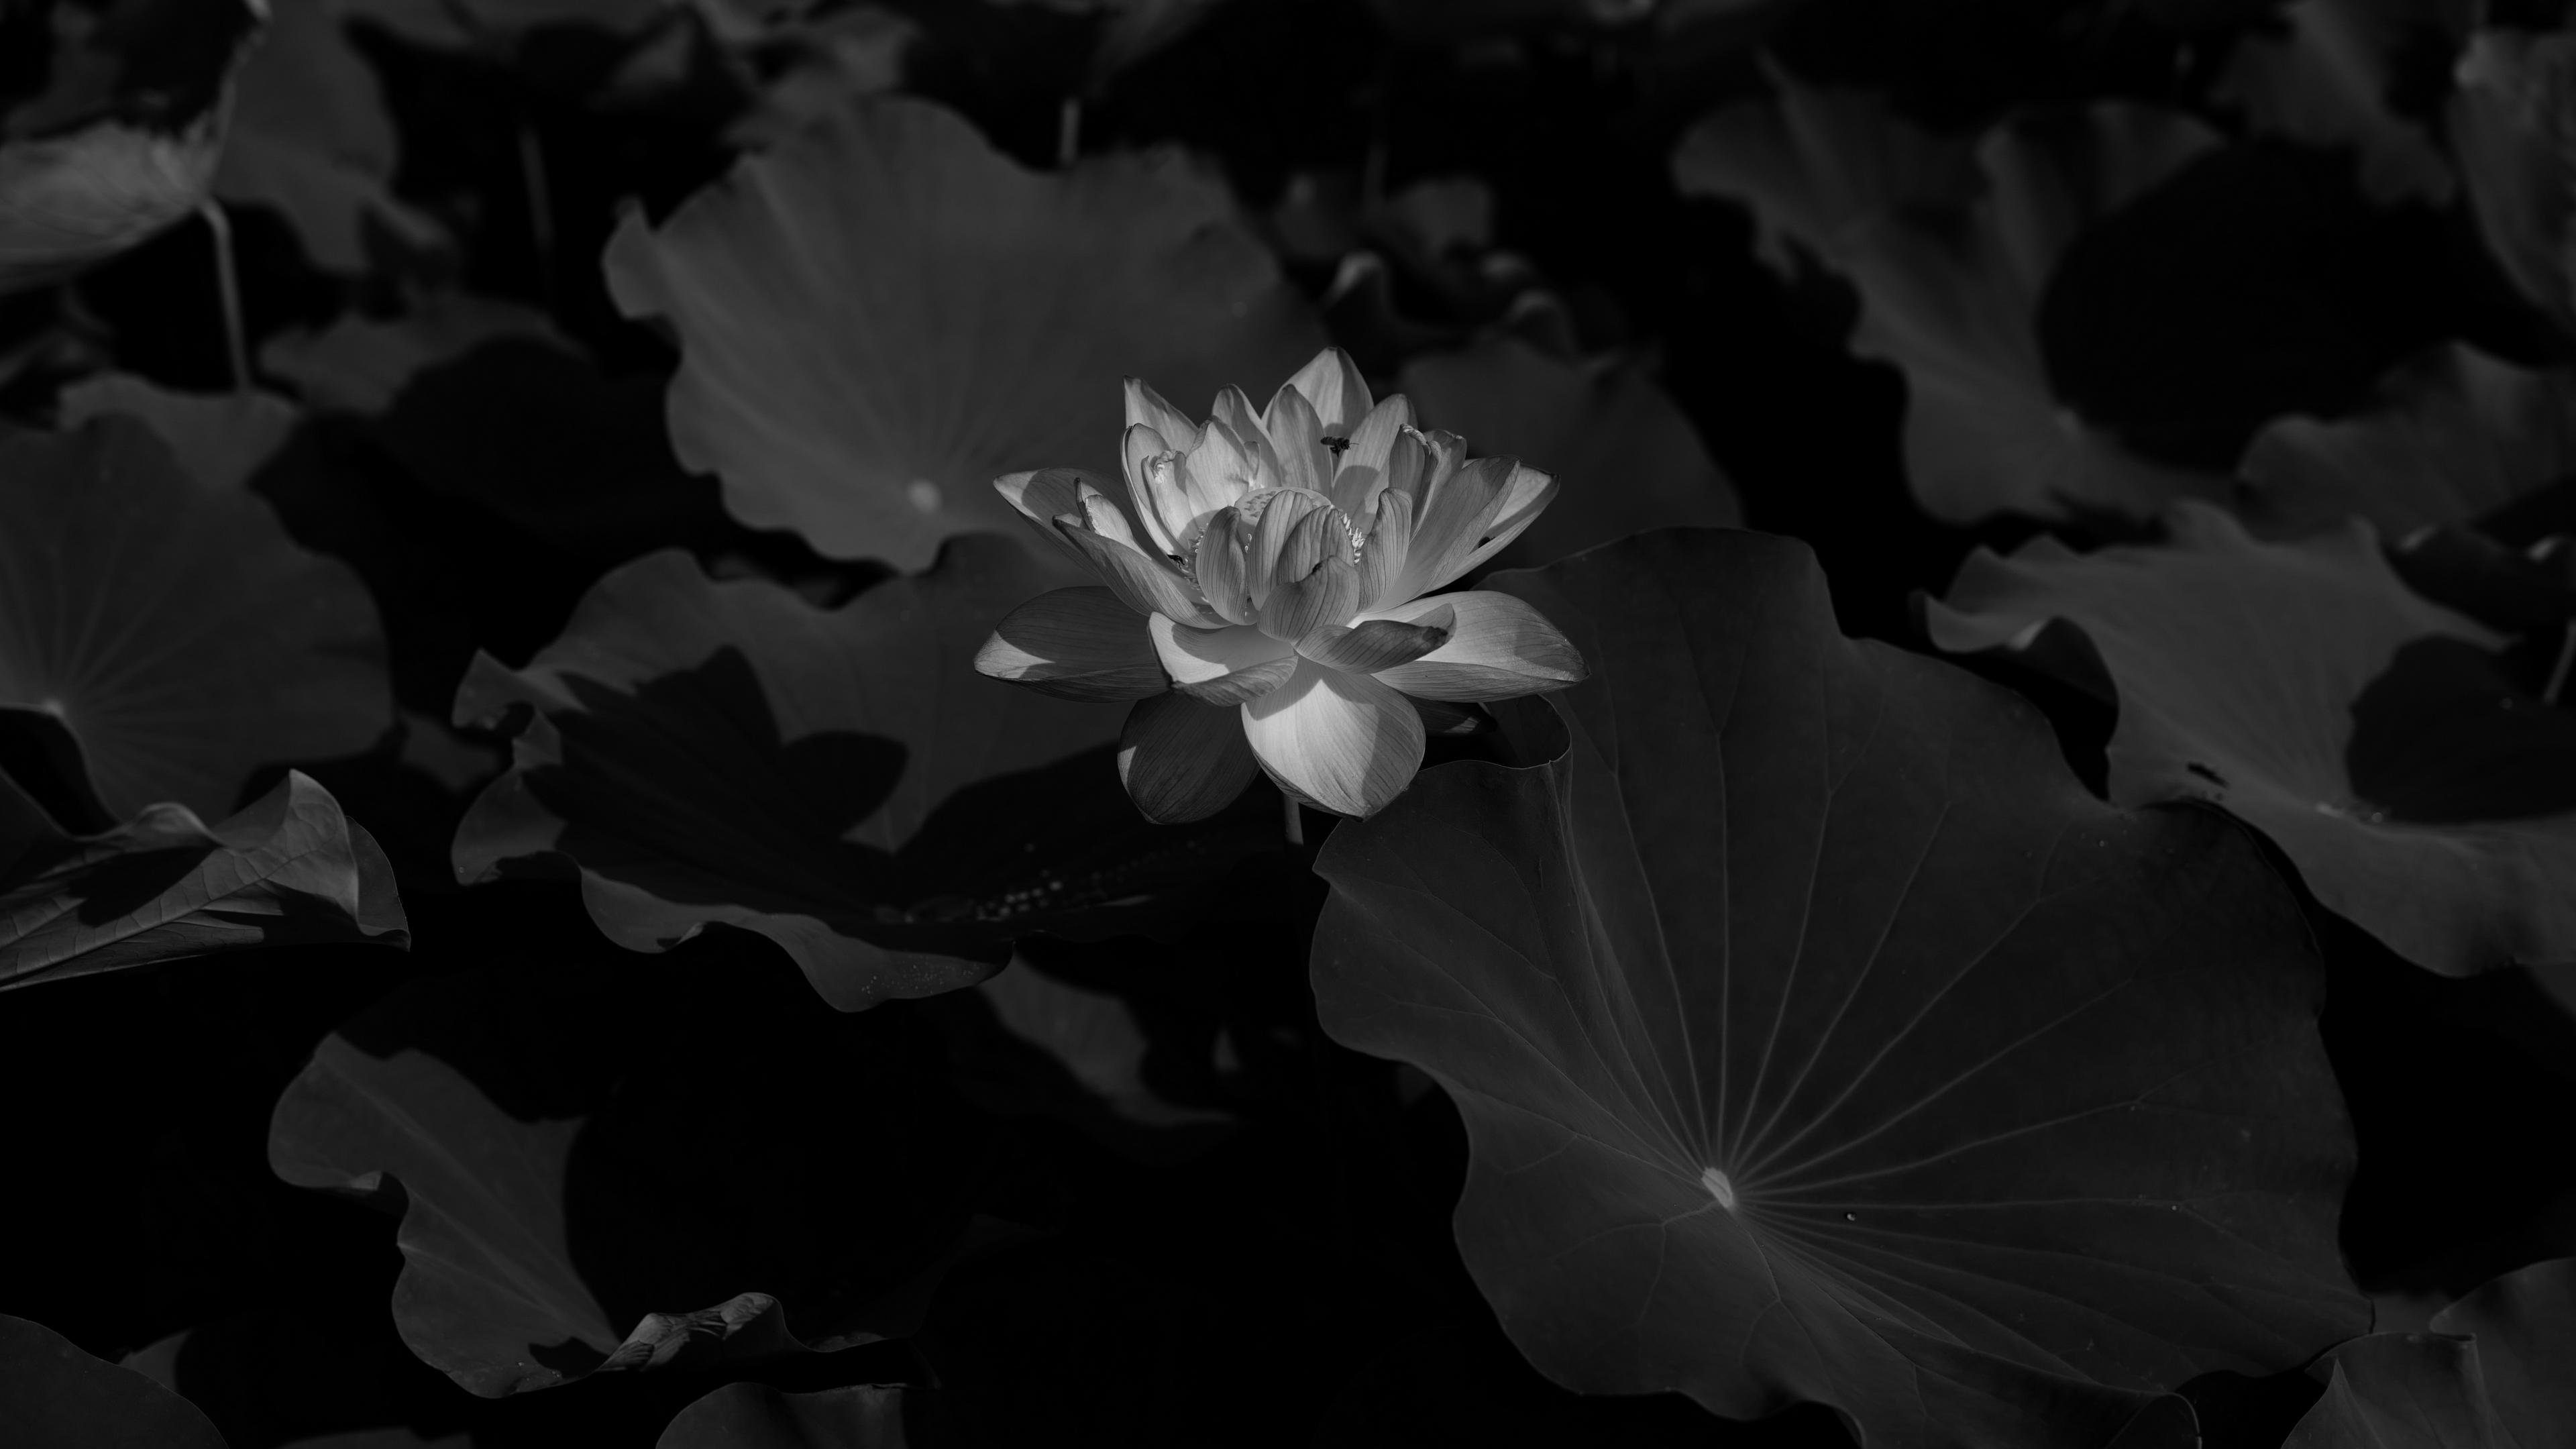 lotus bw leaves blossoms 4k 1540575169 - lotus, bw, leaves, blossoms 4k - Lotus, Leaves, bw